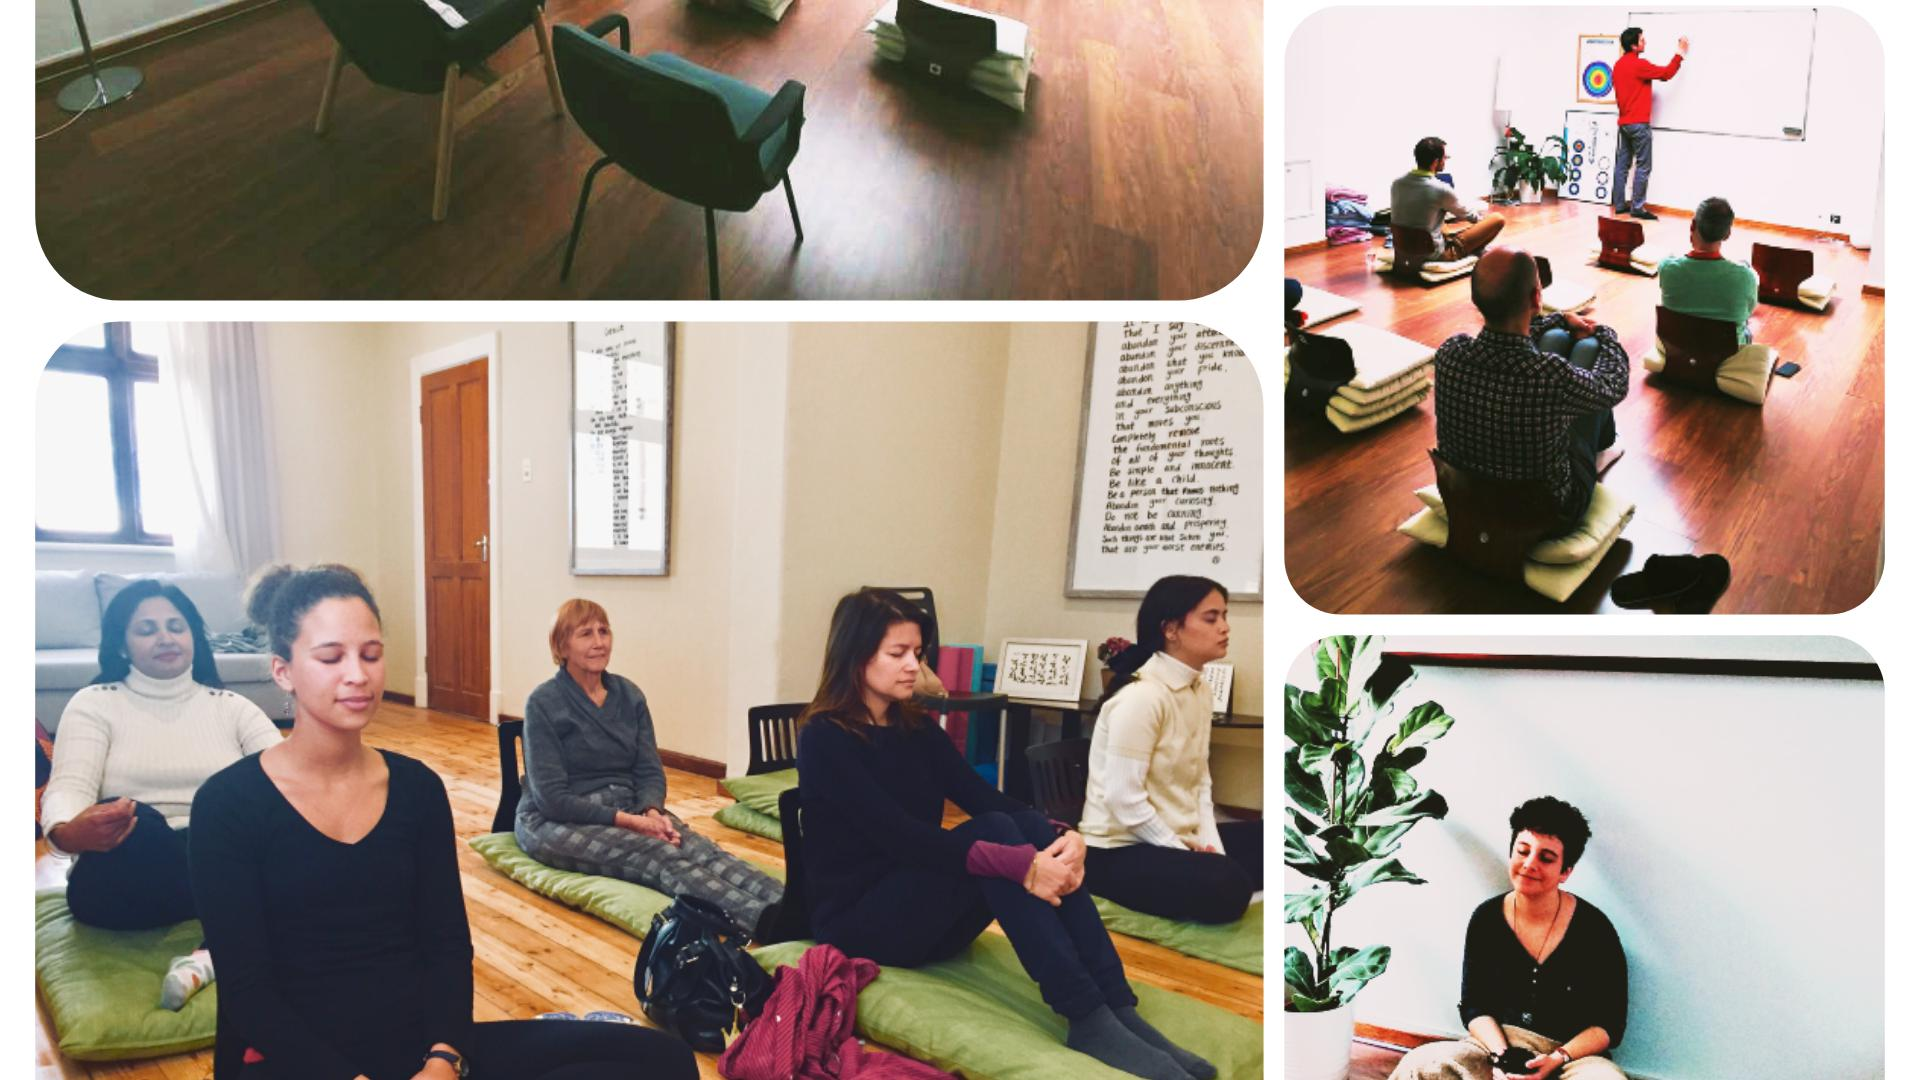 Free Meditation Introduction Class in Meditation Center in Lisbon